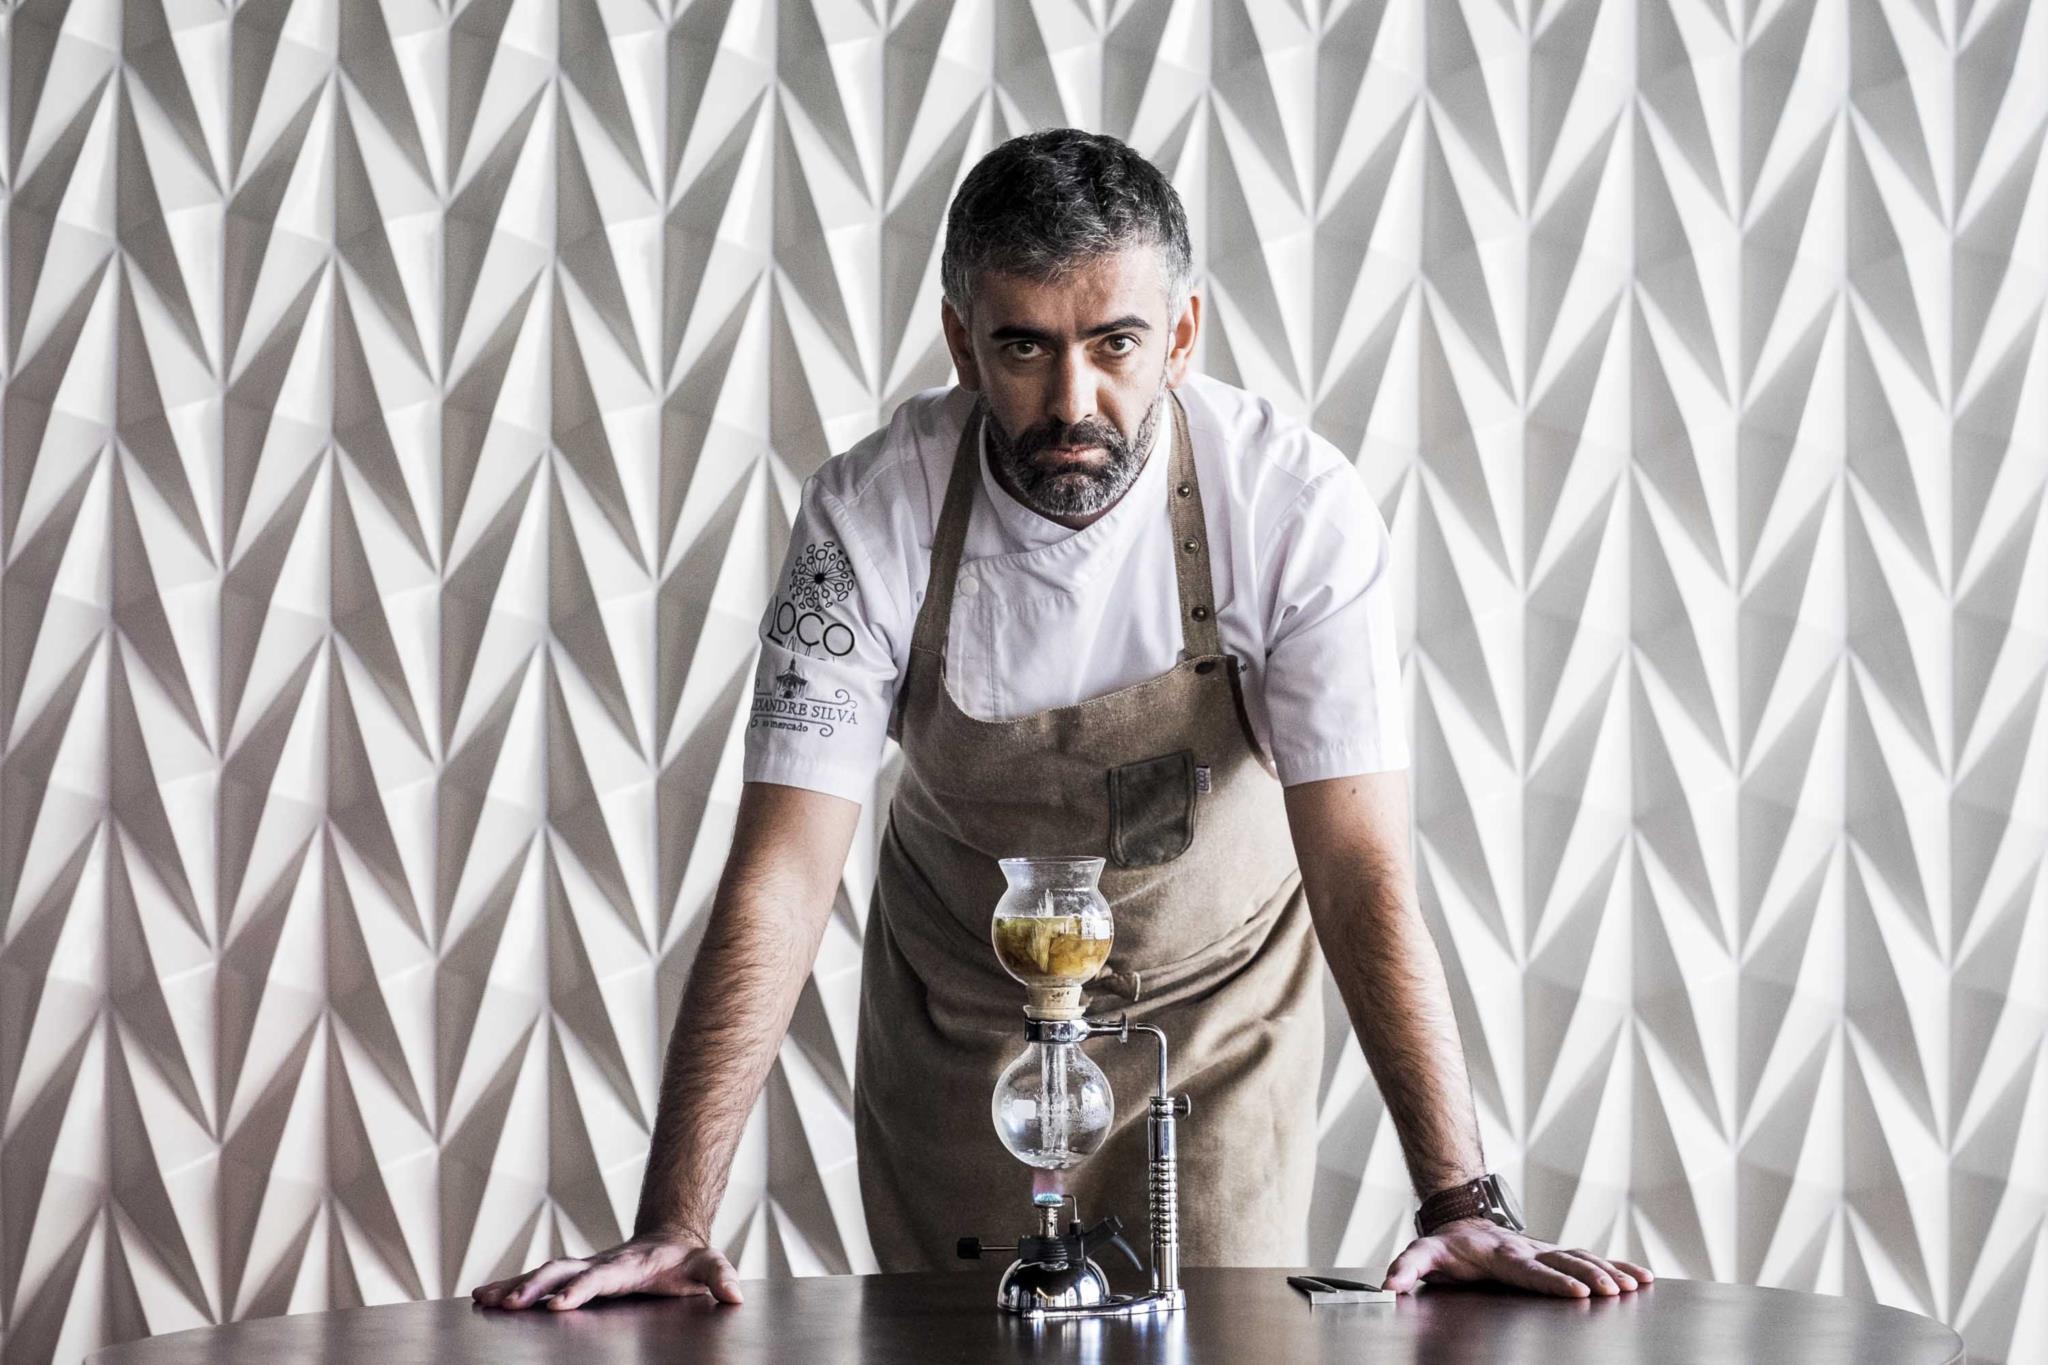 RG Rui Gaudencio - 28 Novembro 2016 - portugal, Lisboa - chefe Chef Alexandre Silva, do restaurante Loco, distinguido este ano com uma estrela michelin, Guia Michelin